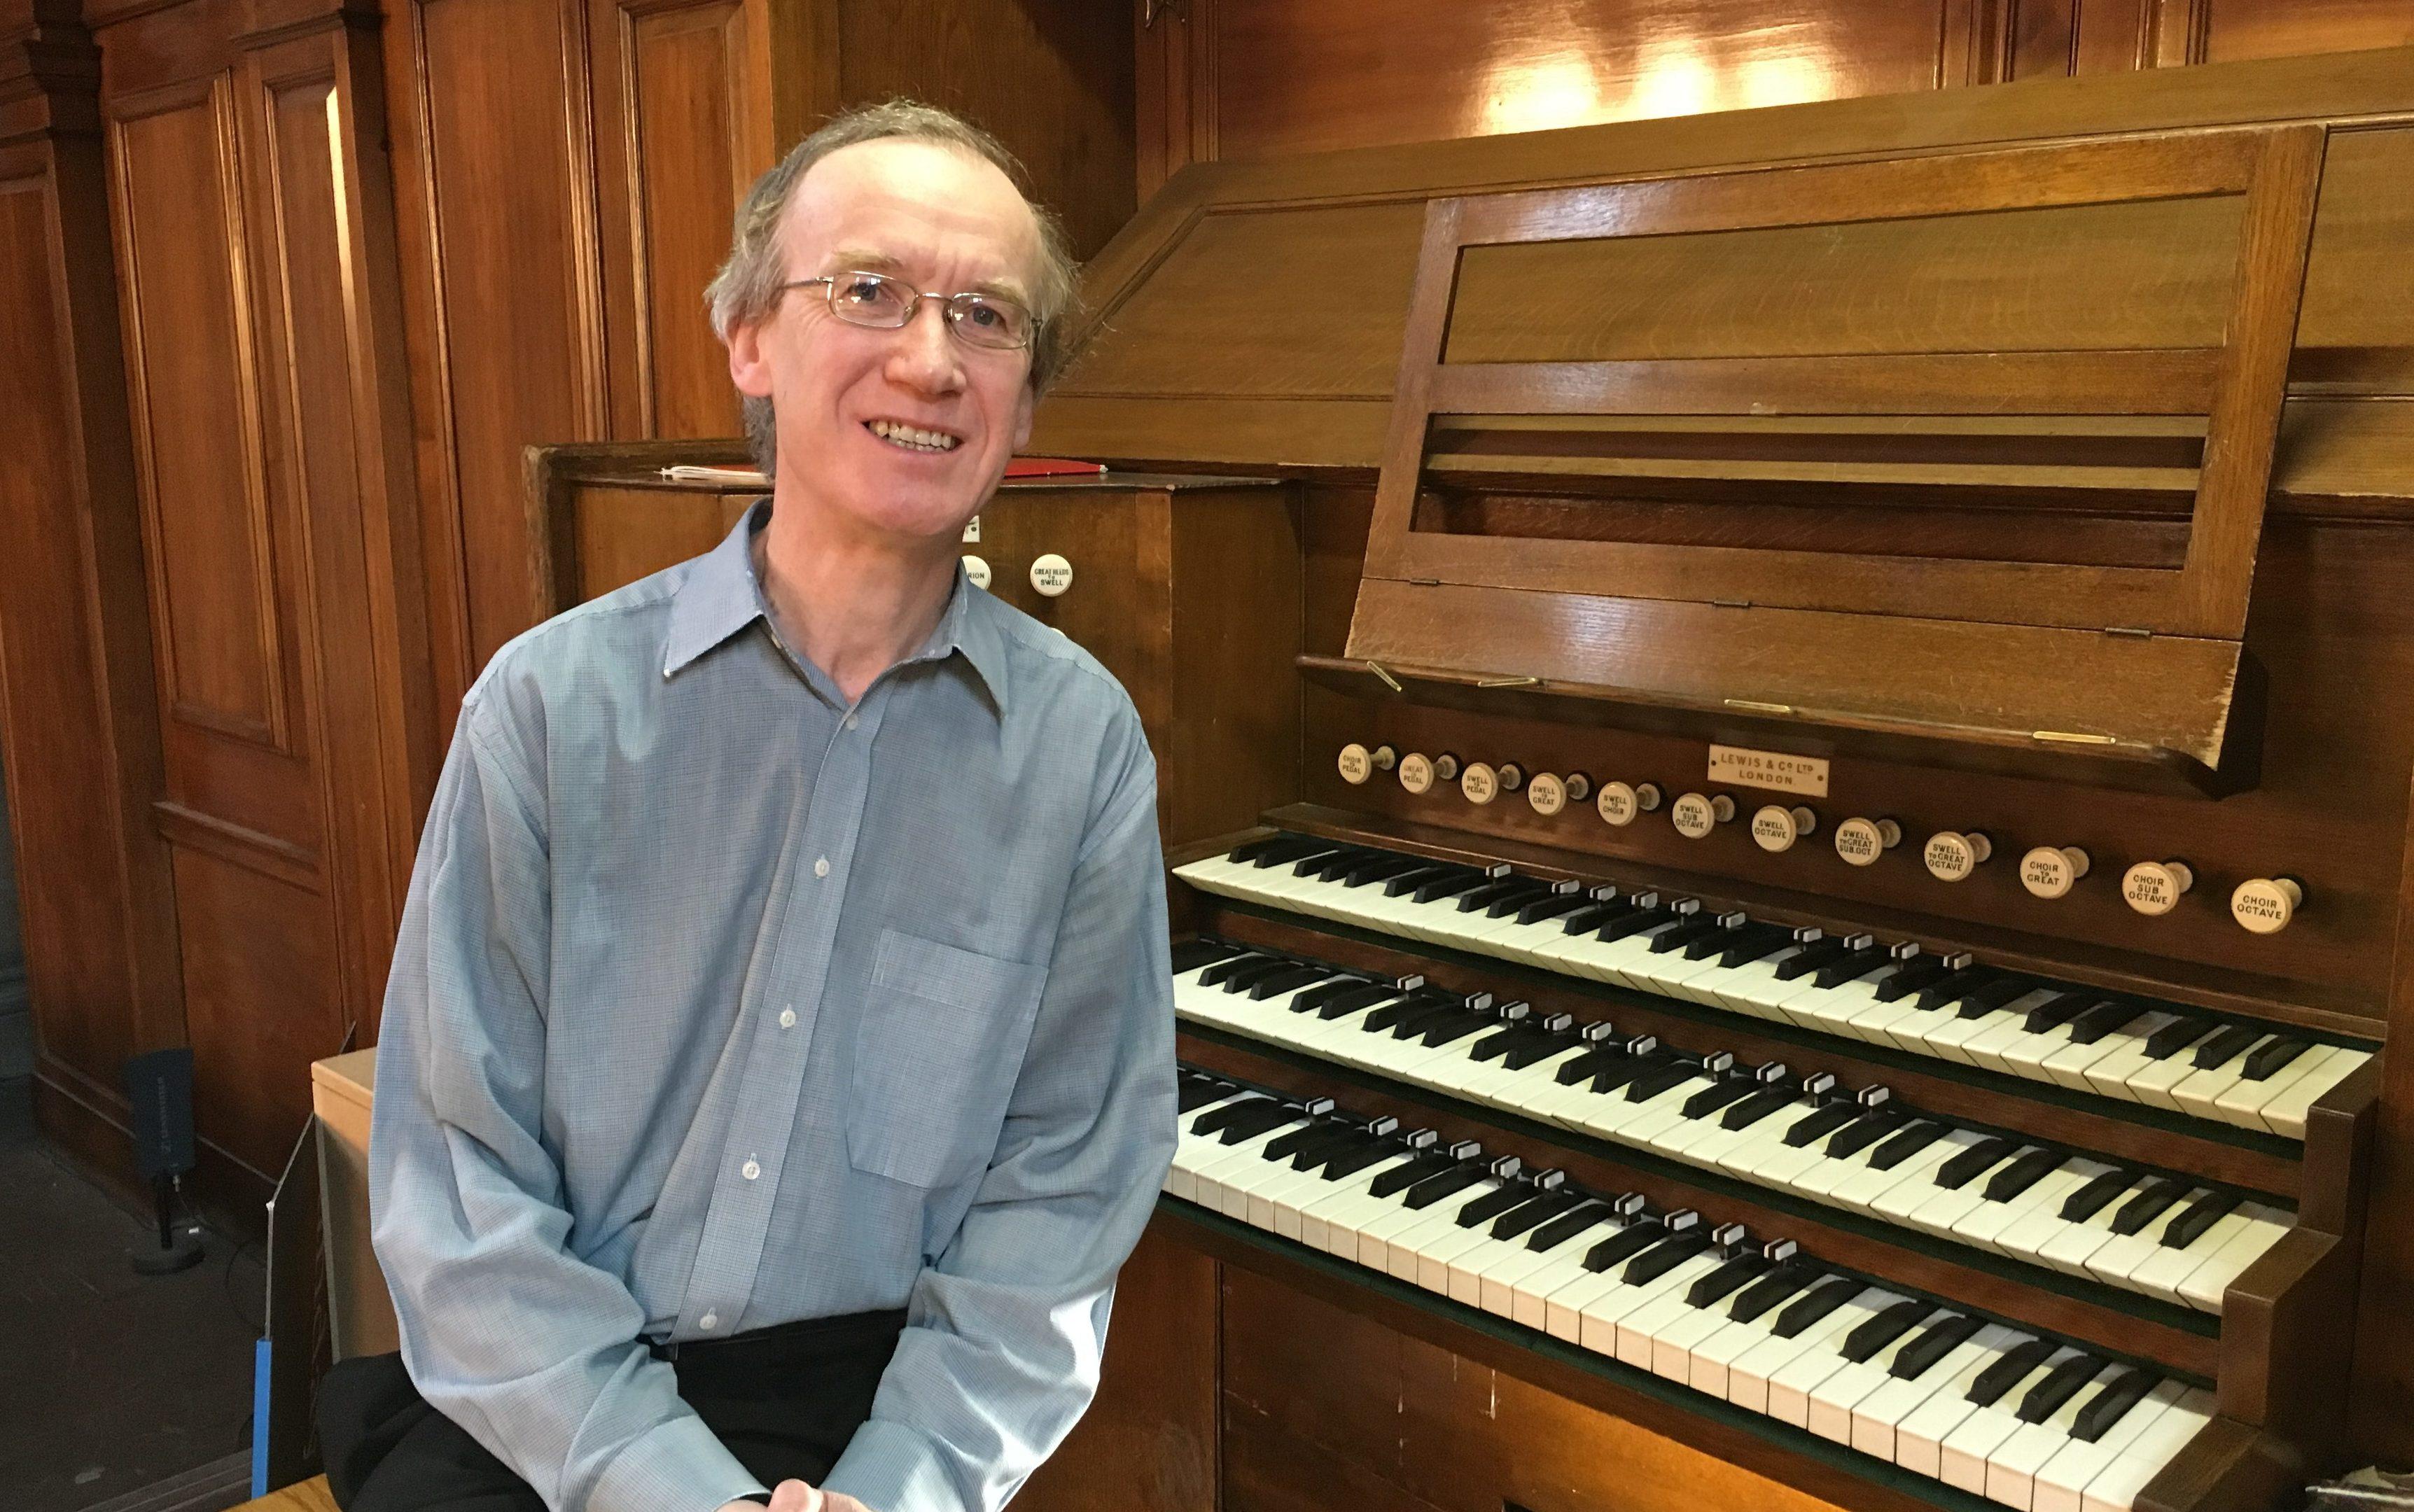 Chris Nickol, one of Kelvingrove's organists (Ross Crae / DC Thomson)